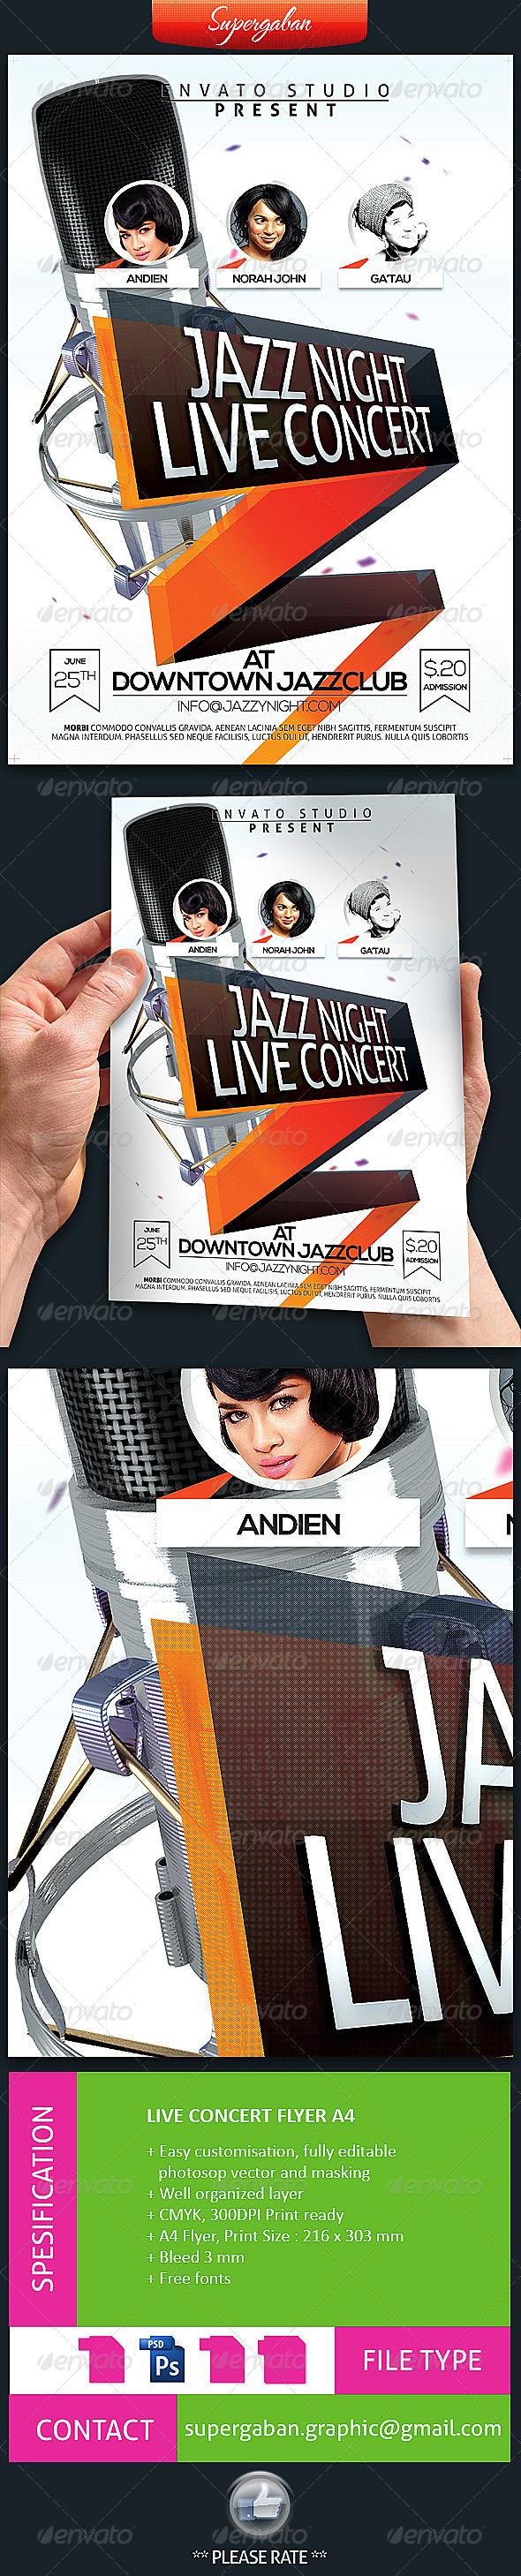 GraphicRiver Live Concert Flyer 7549331